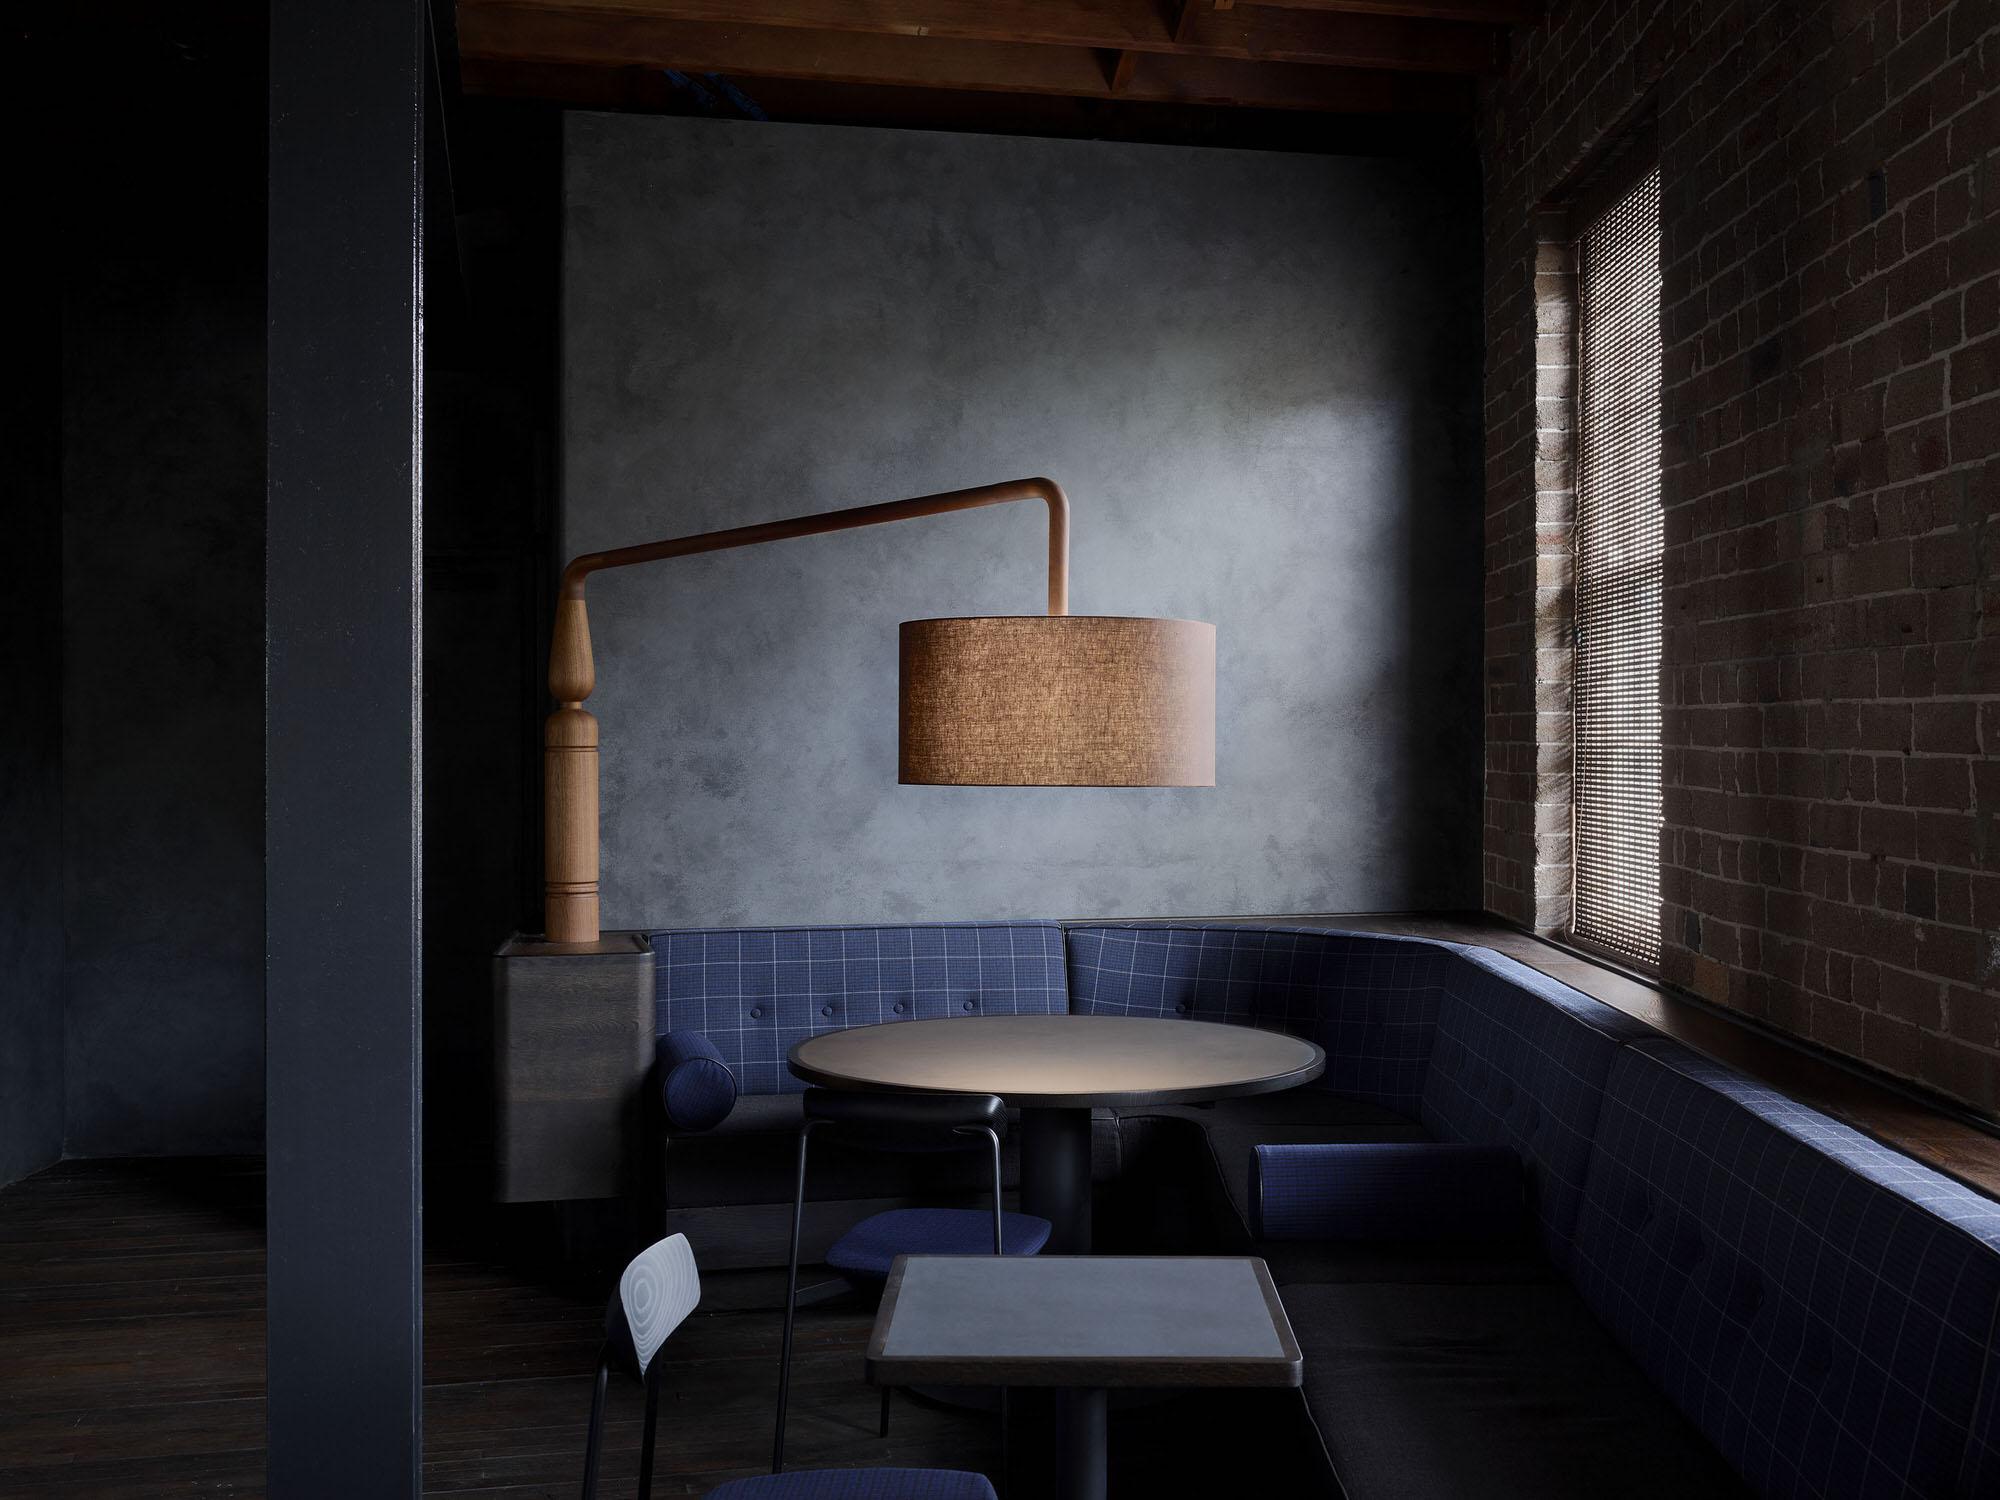 Four Pillars Laboratory Surry Hills Ysg Studio Sydney Bar Interiors Photo Anson Smart Yellowtrace 28